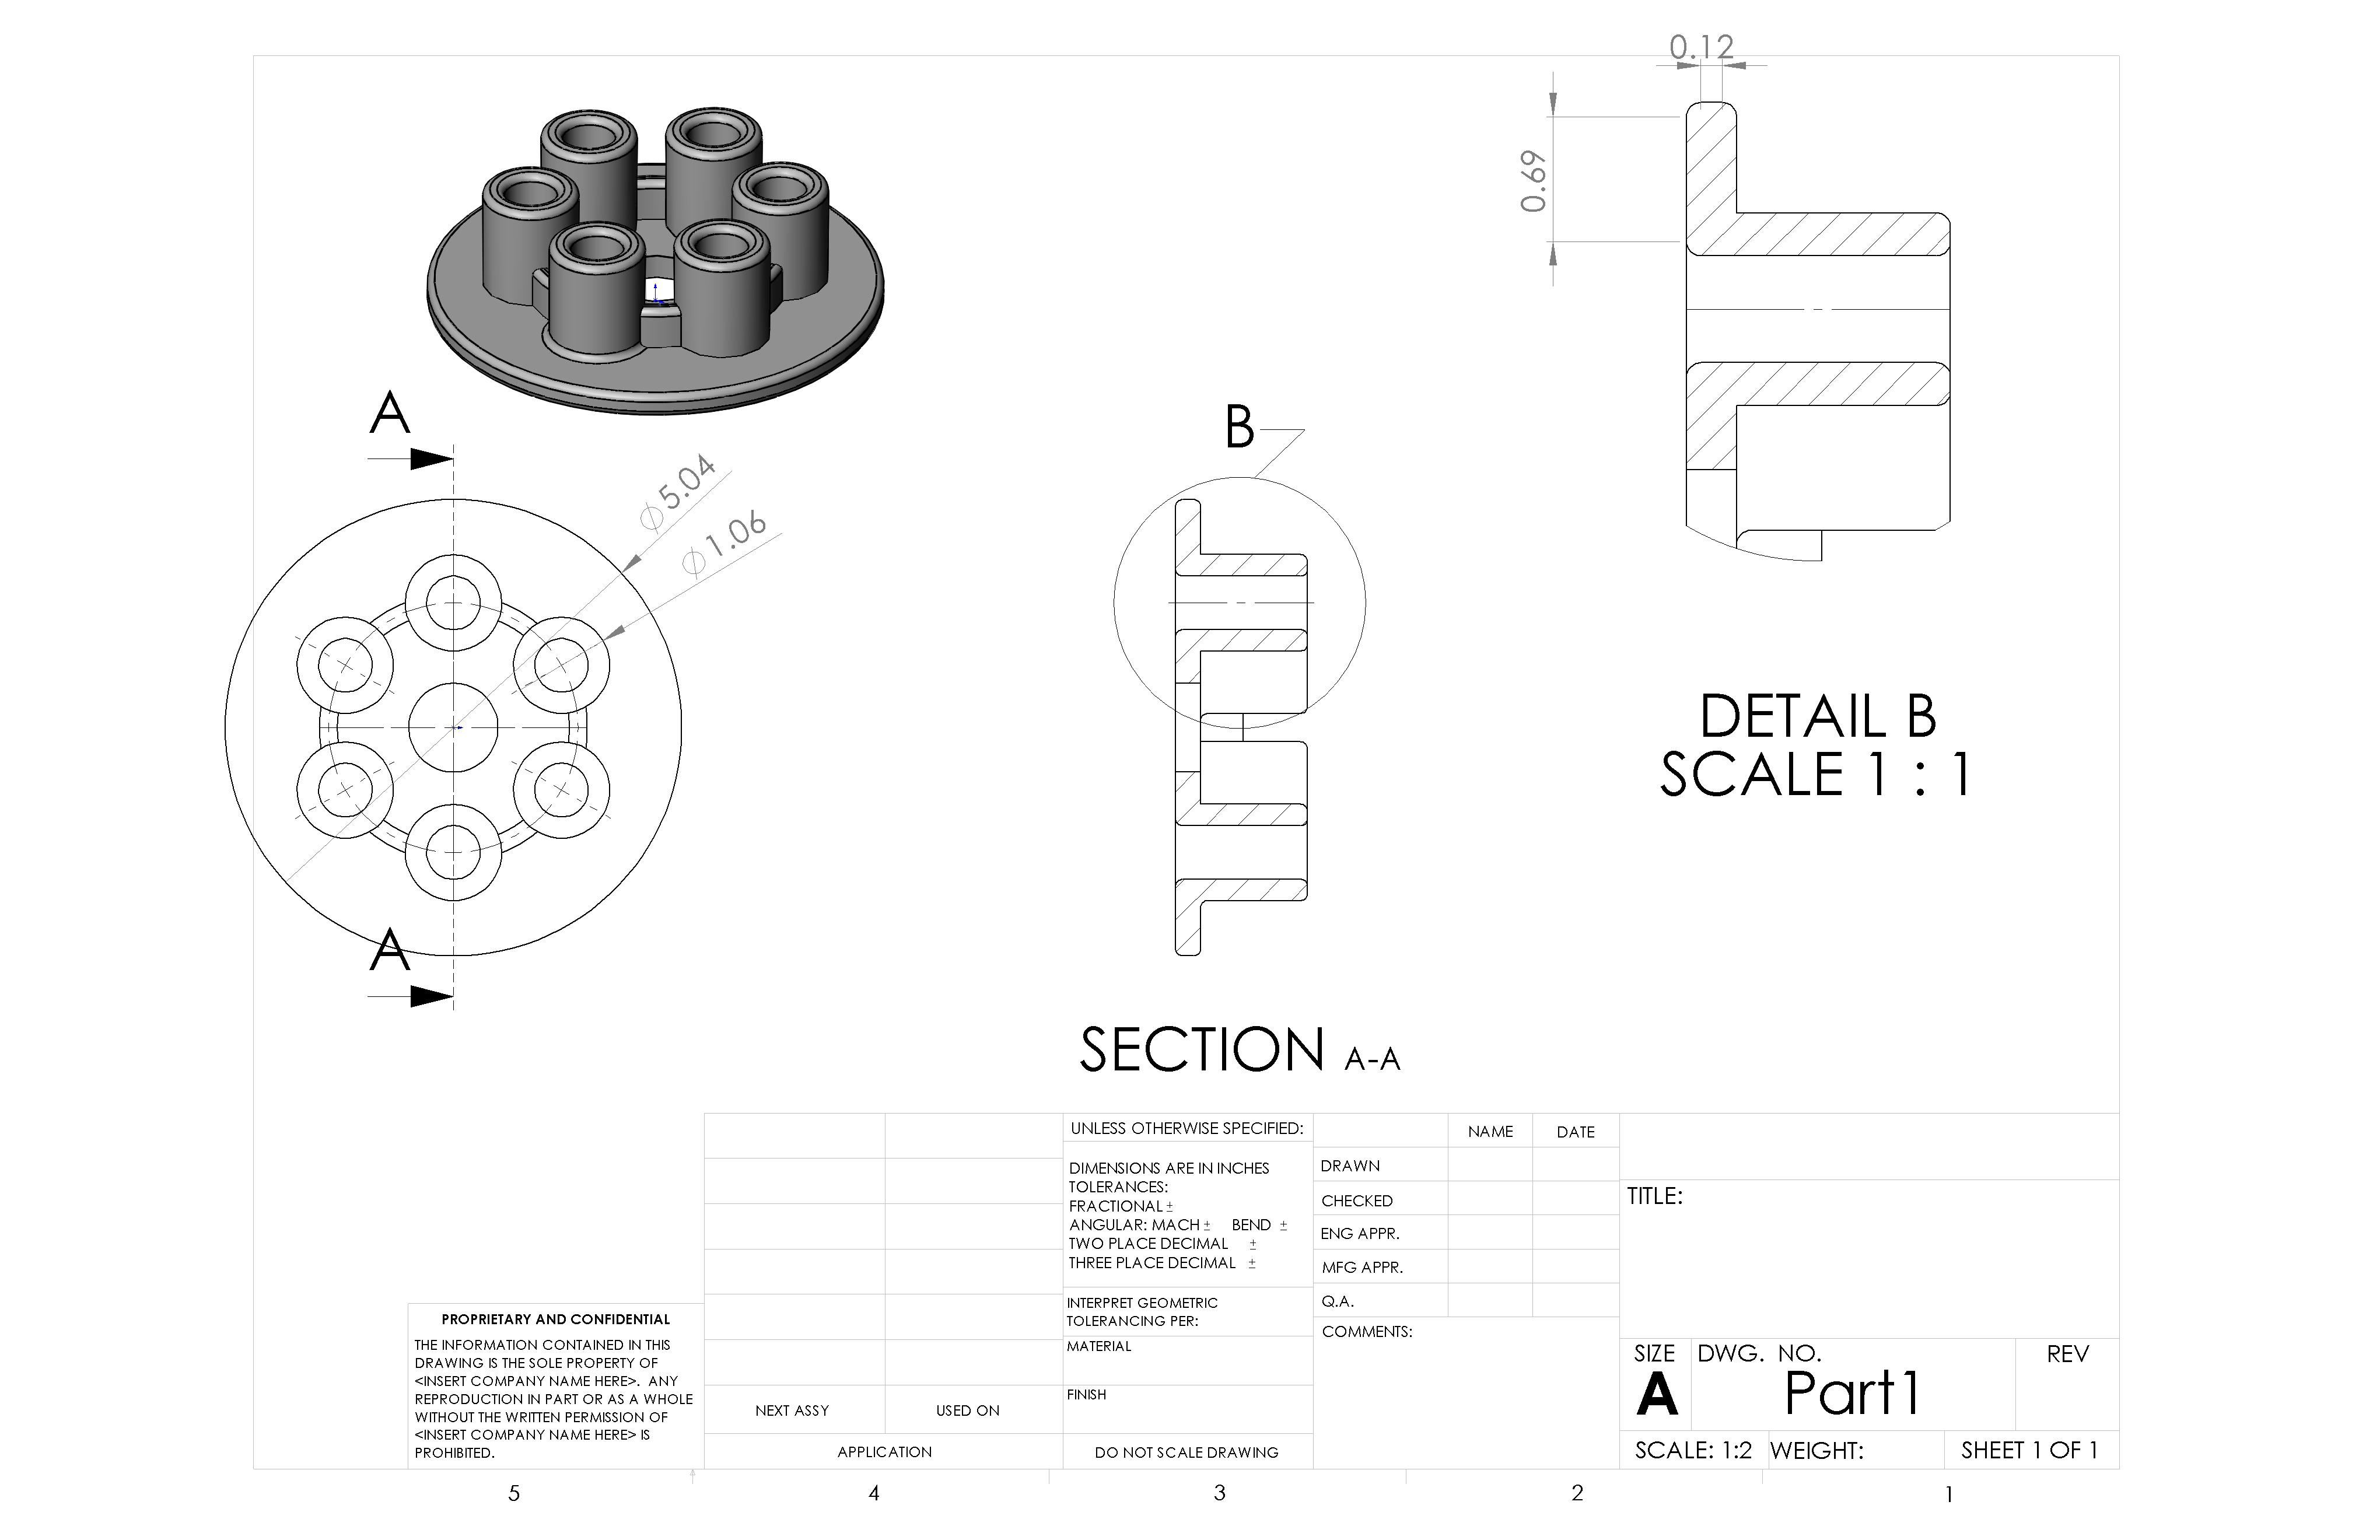 Solidworks drafting tutorial pdf.